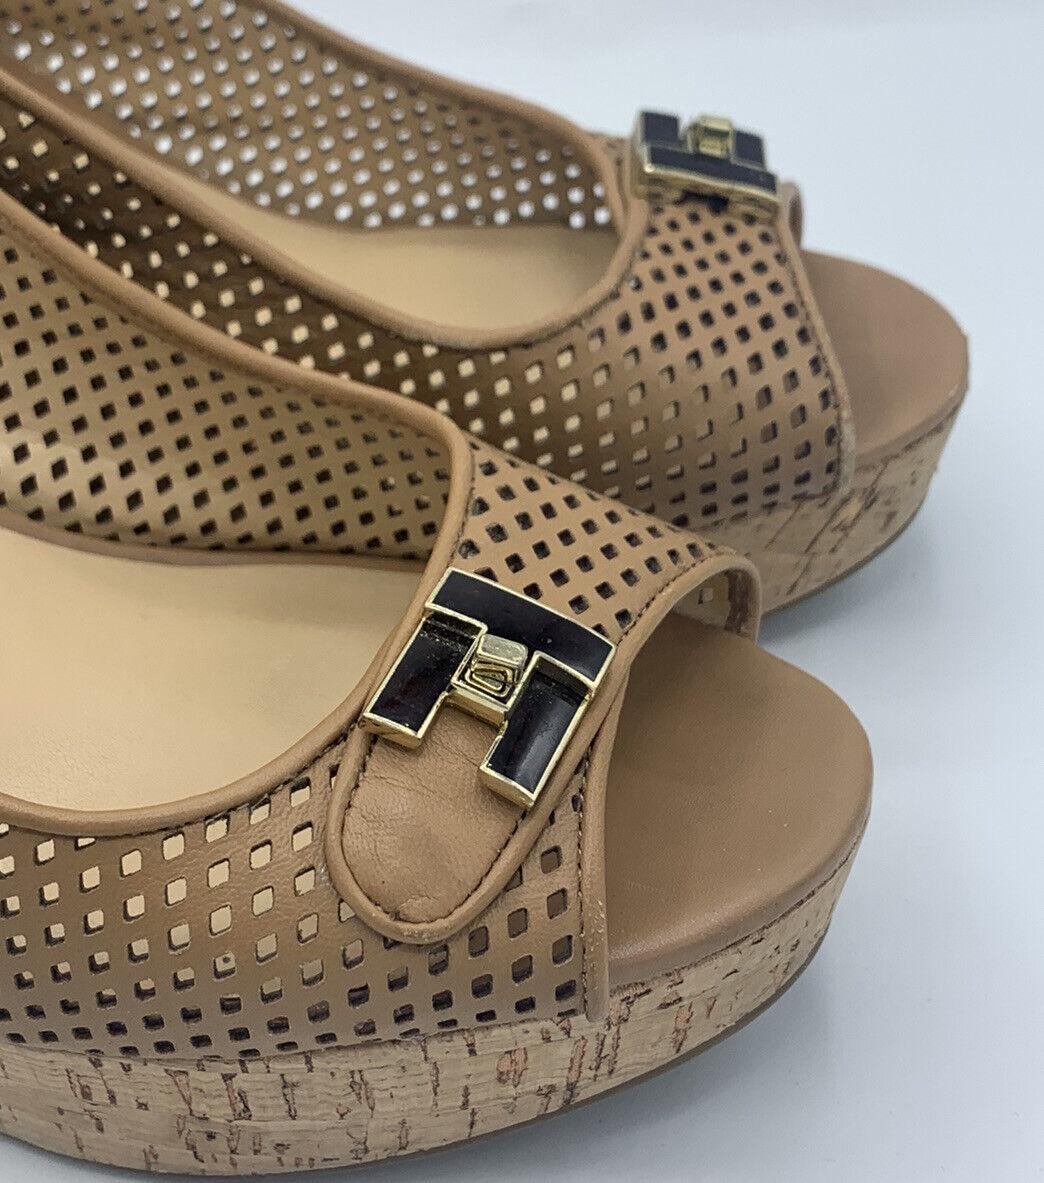 Tommy Hilfiger Size 8.5 M Tan Leather Cork Wedges - image 2